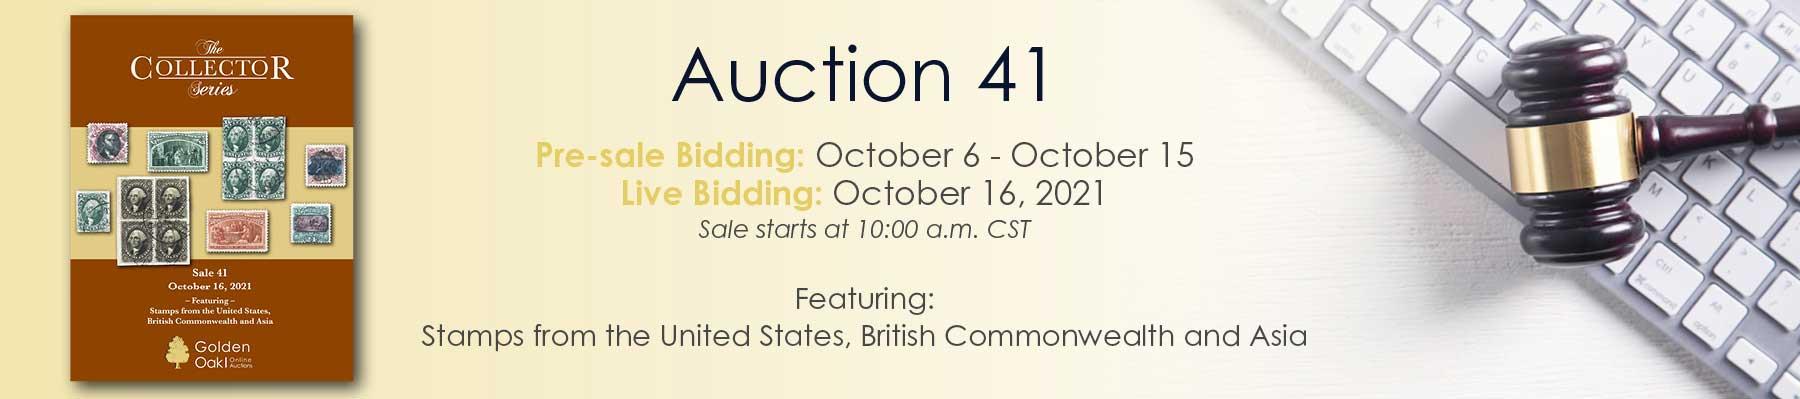 Sale 41  Announce